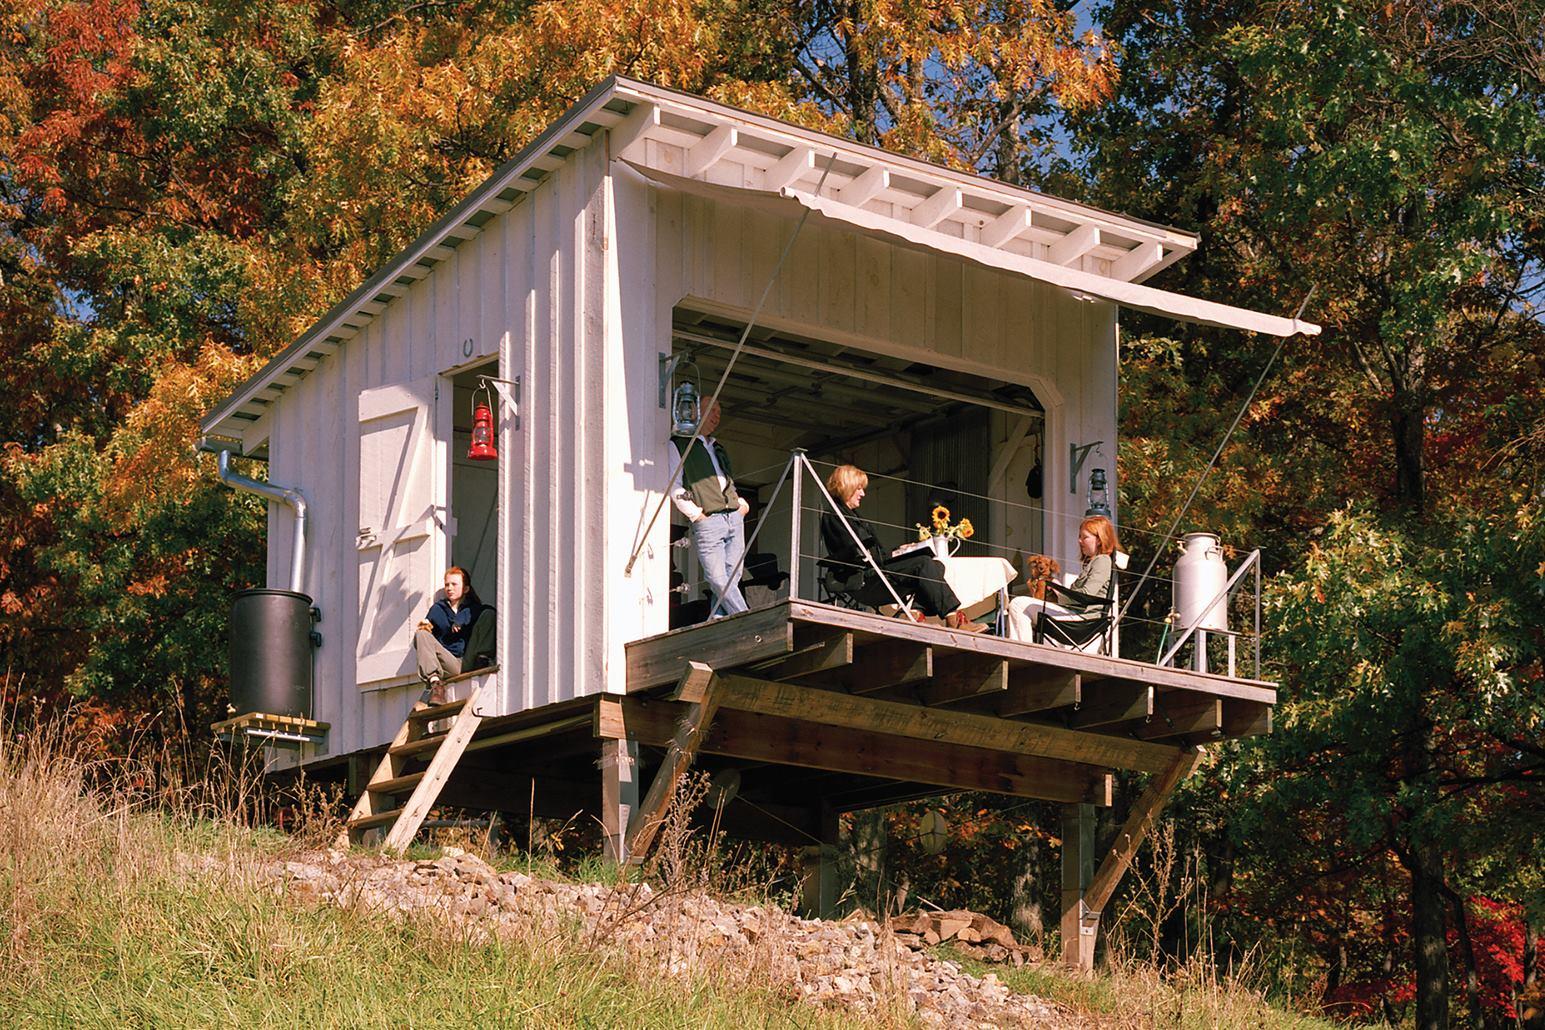 The shack at hinkle farm upper tract w va custom home for Shack at hinkle farm